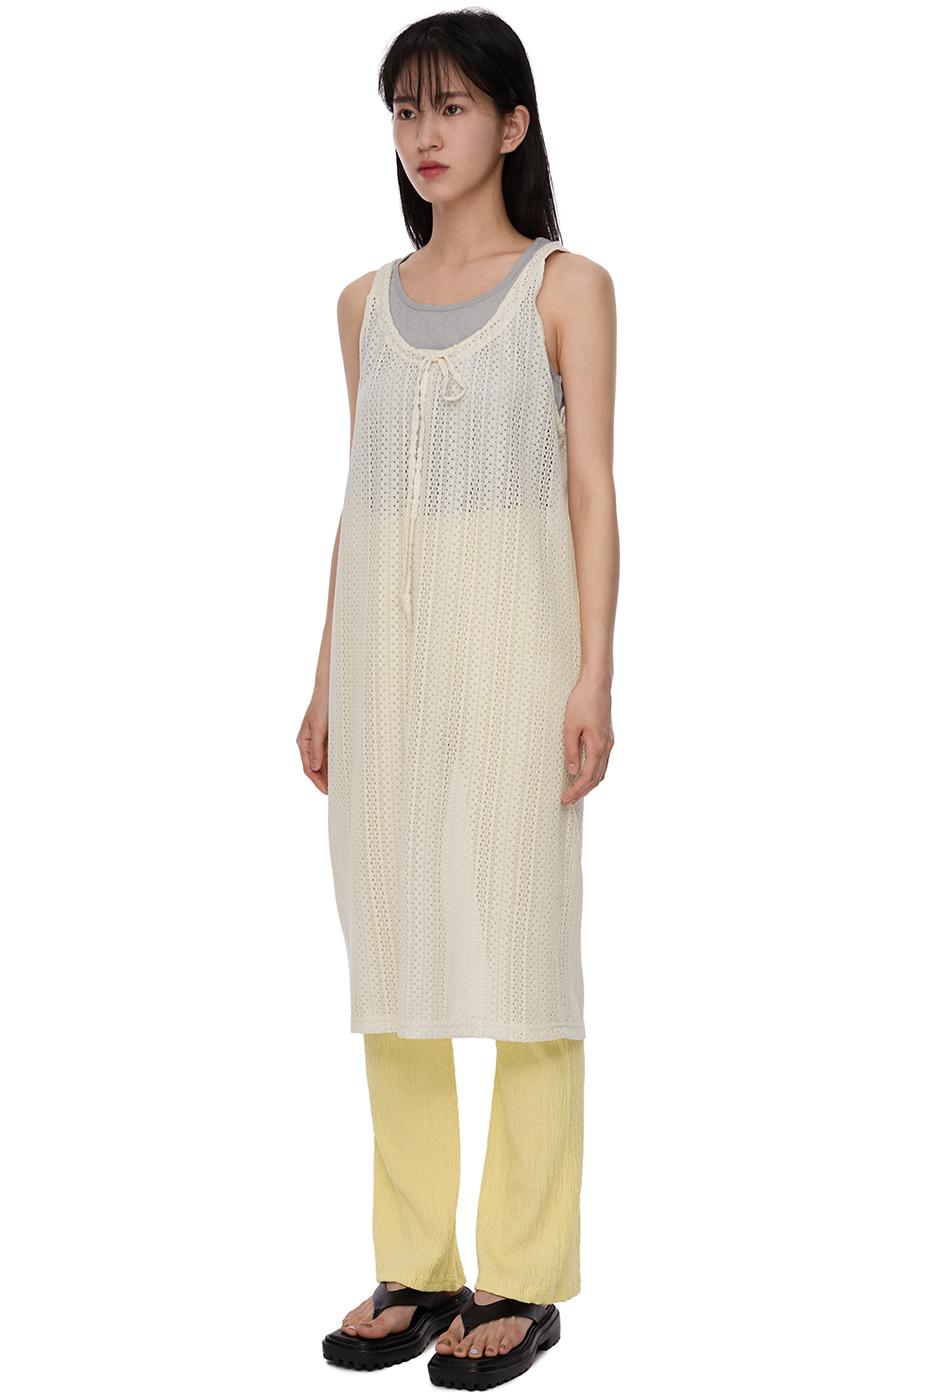 Layered Knitwear String Mid-Length Dress